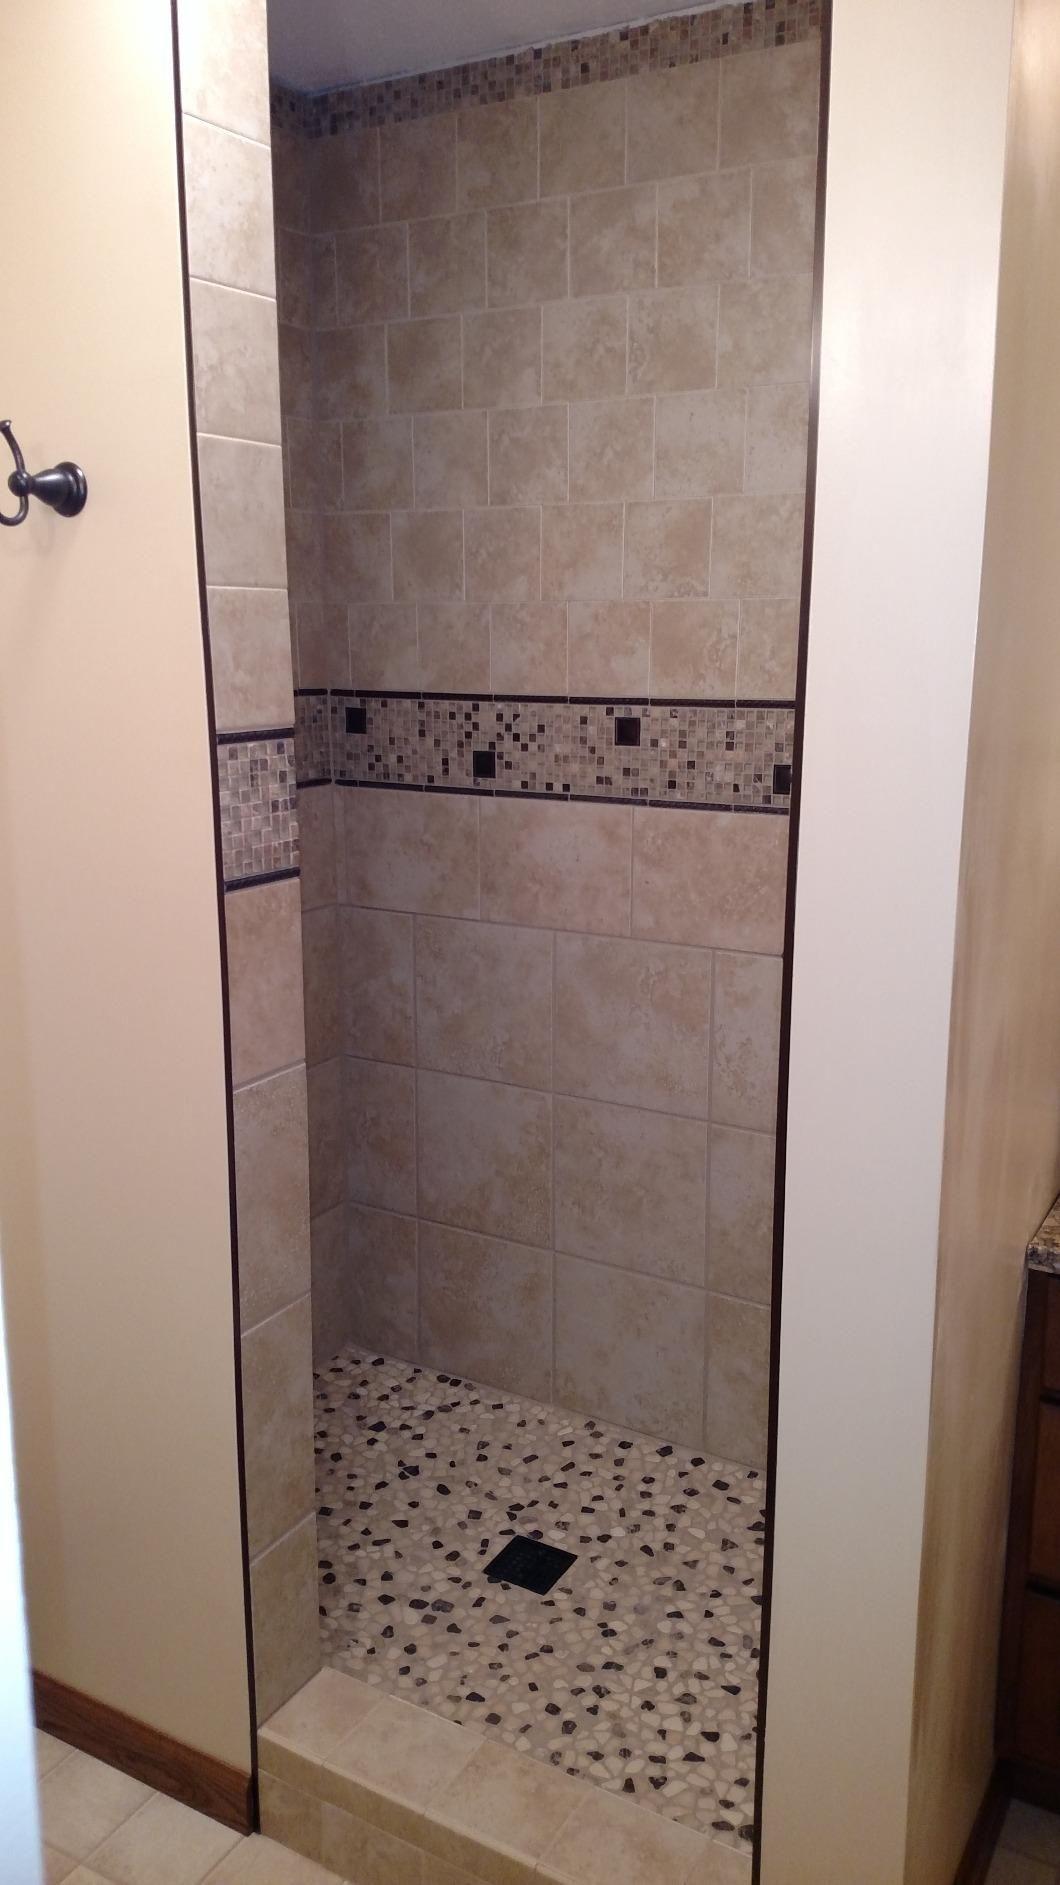 Best Shower Drain Reviews Shower drain, Shower filter